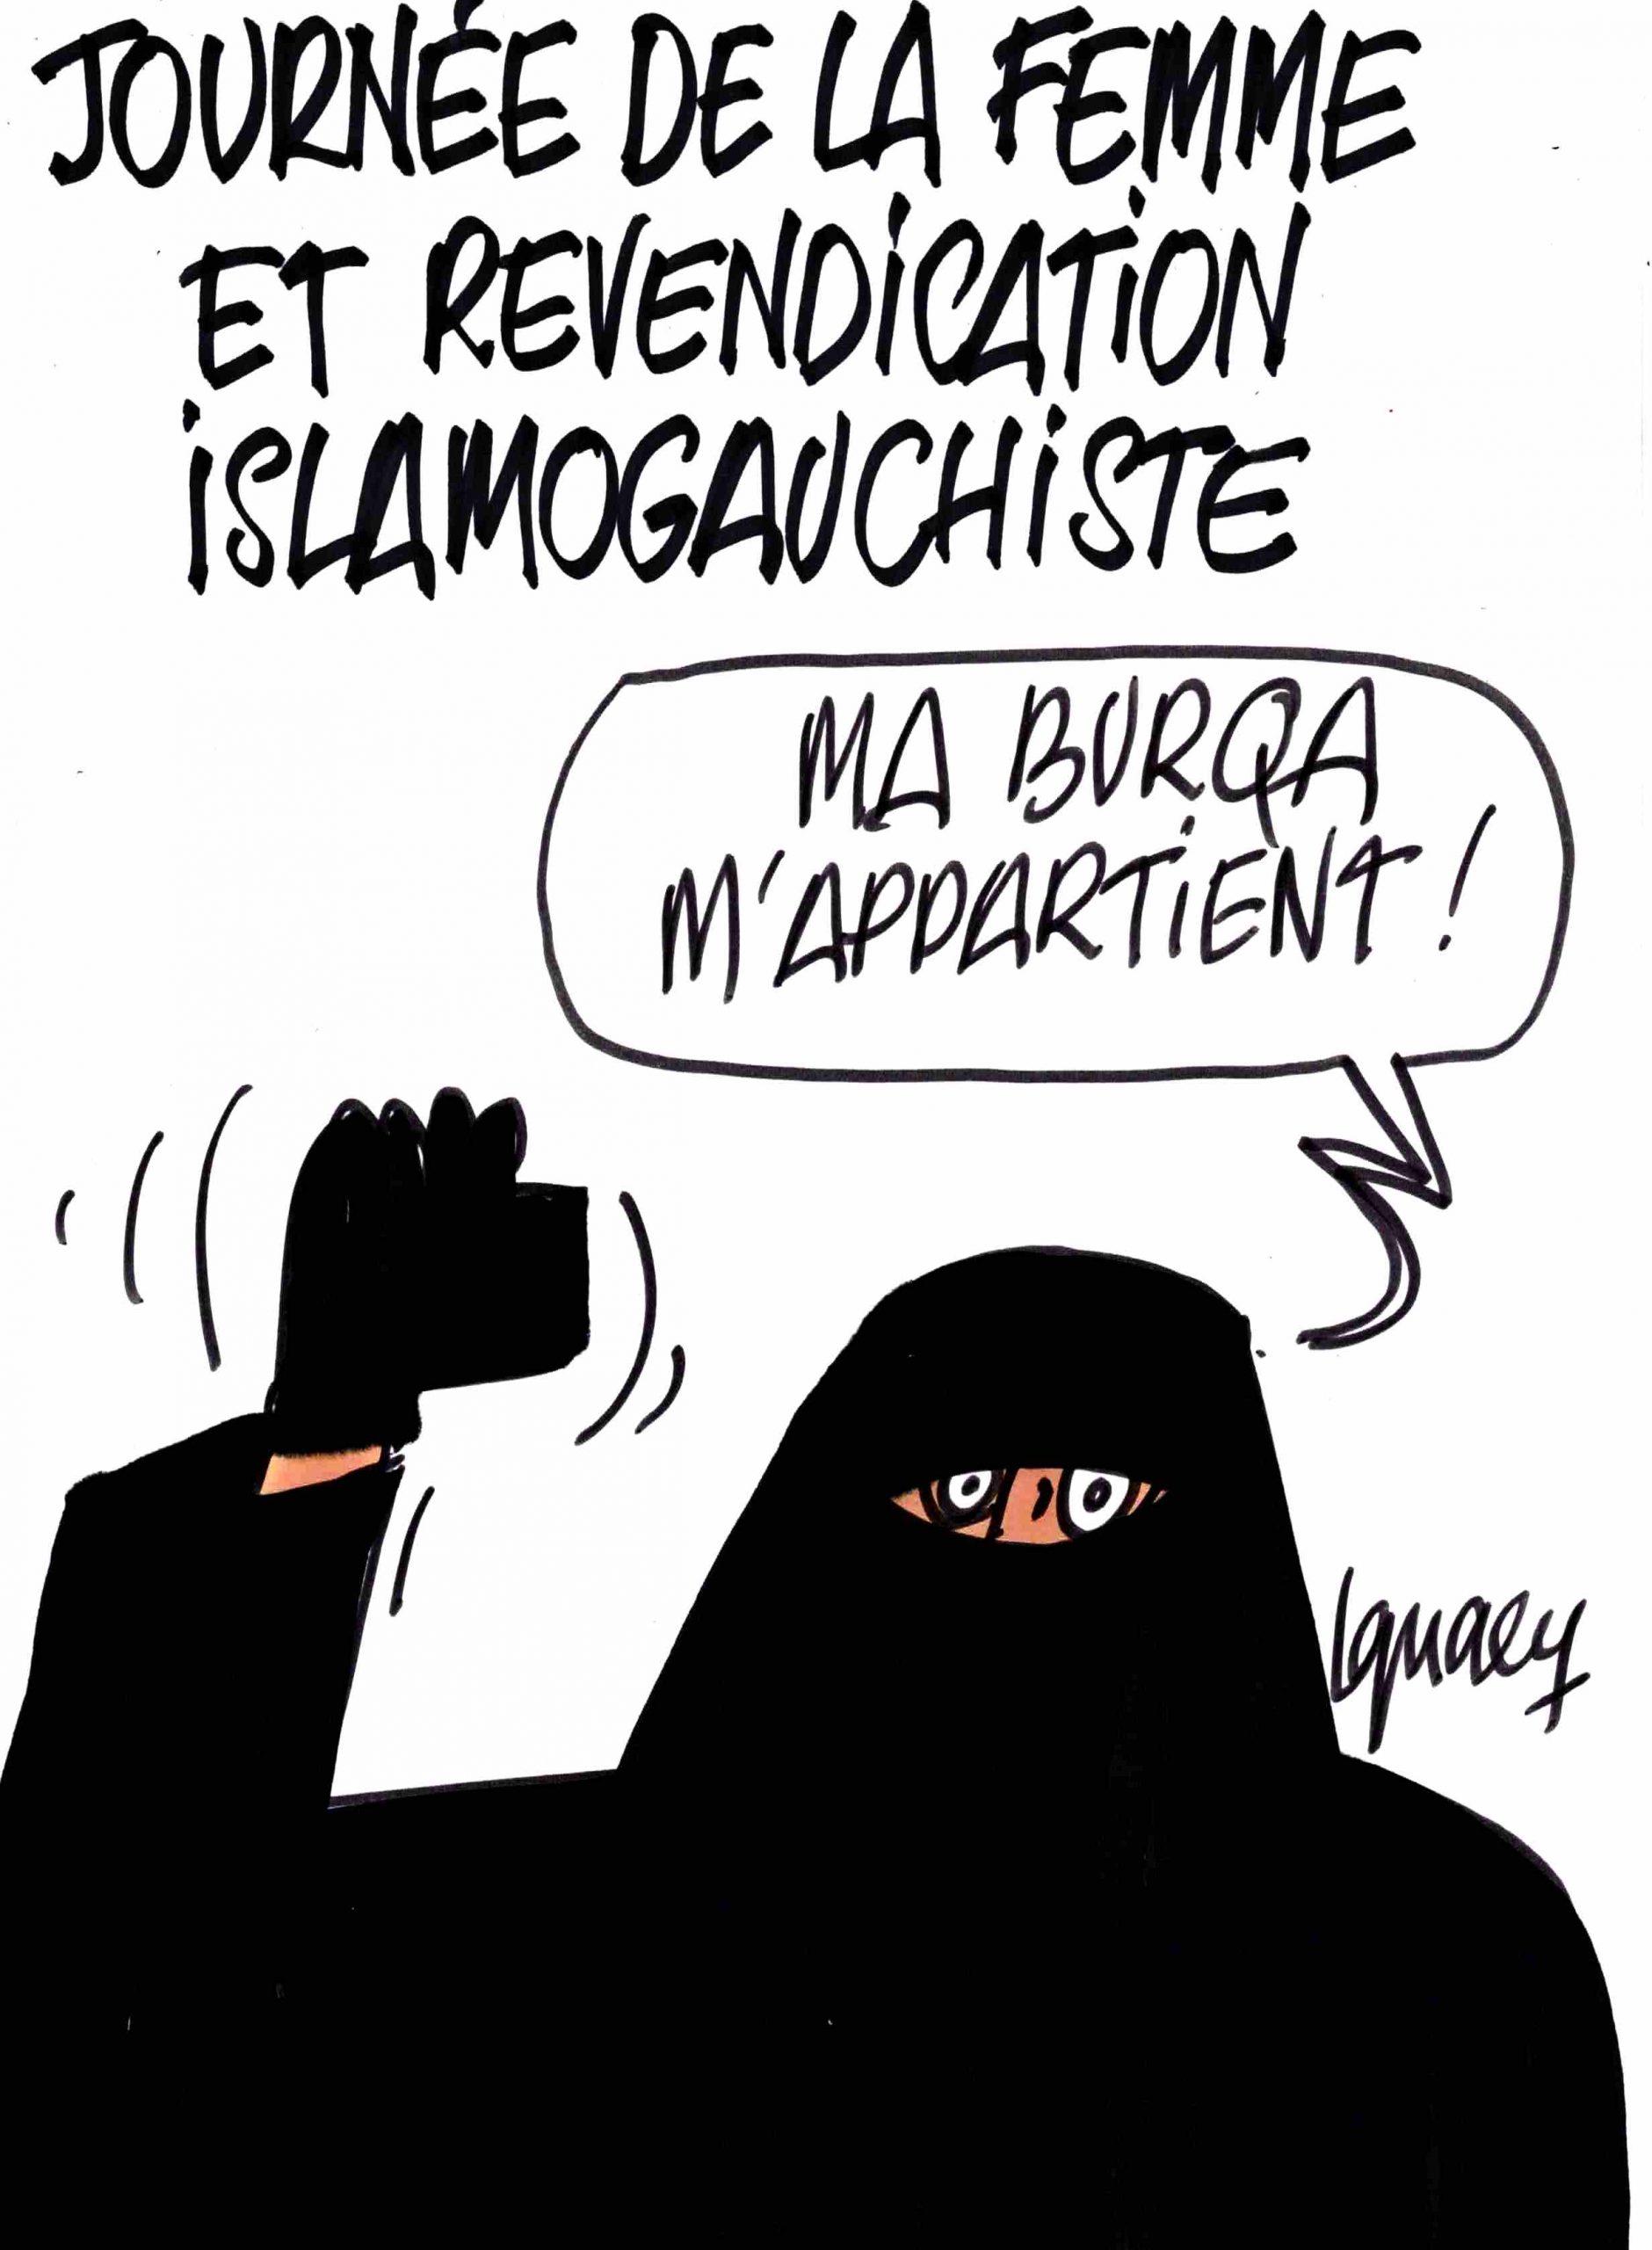 Ignace - Journée de la femme et islamogauchisme